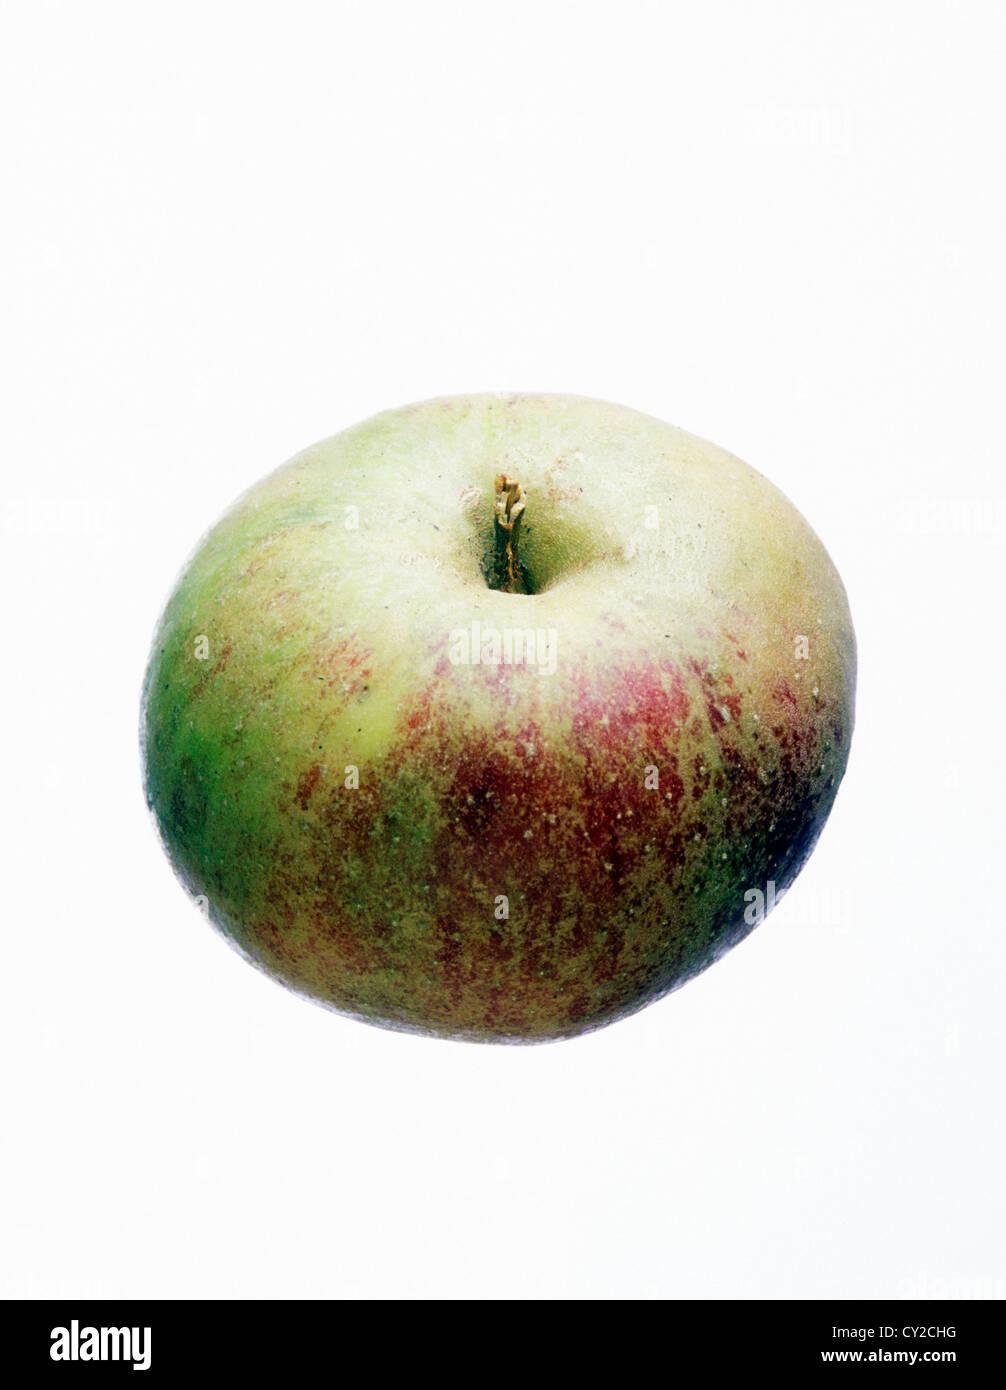 Cox apple, UK apple. - Stock Image